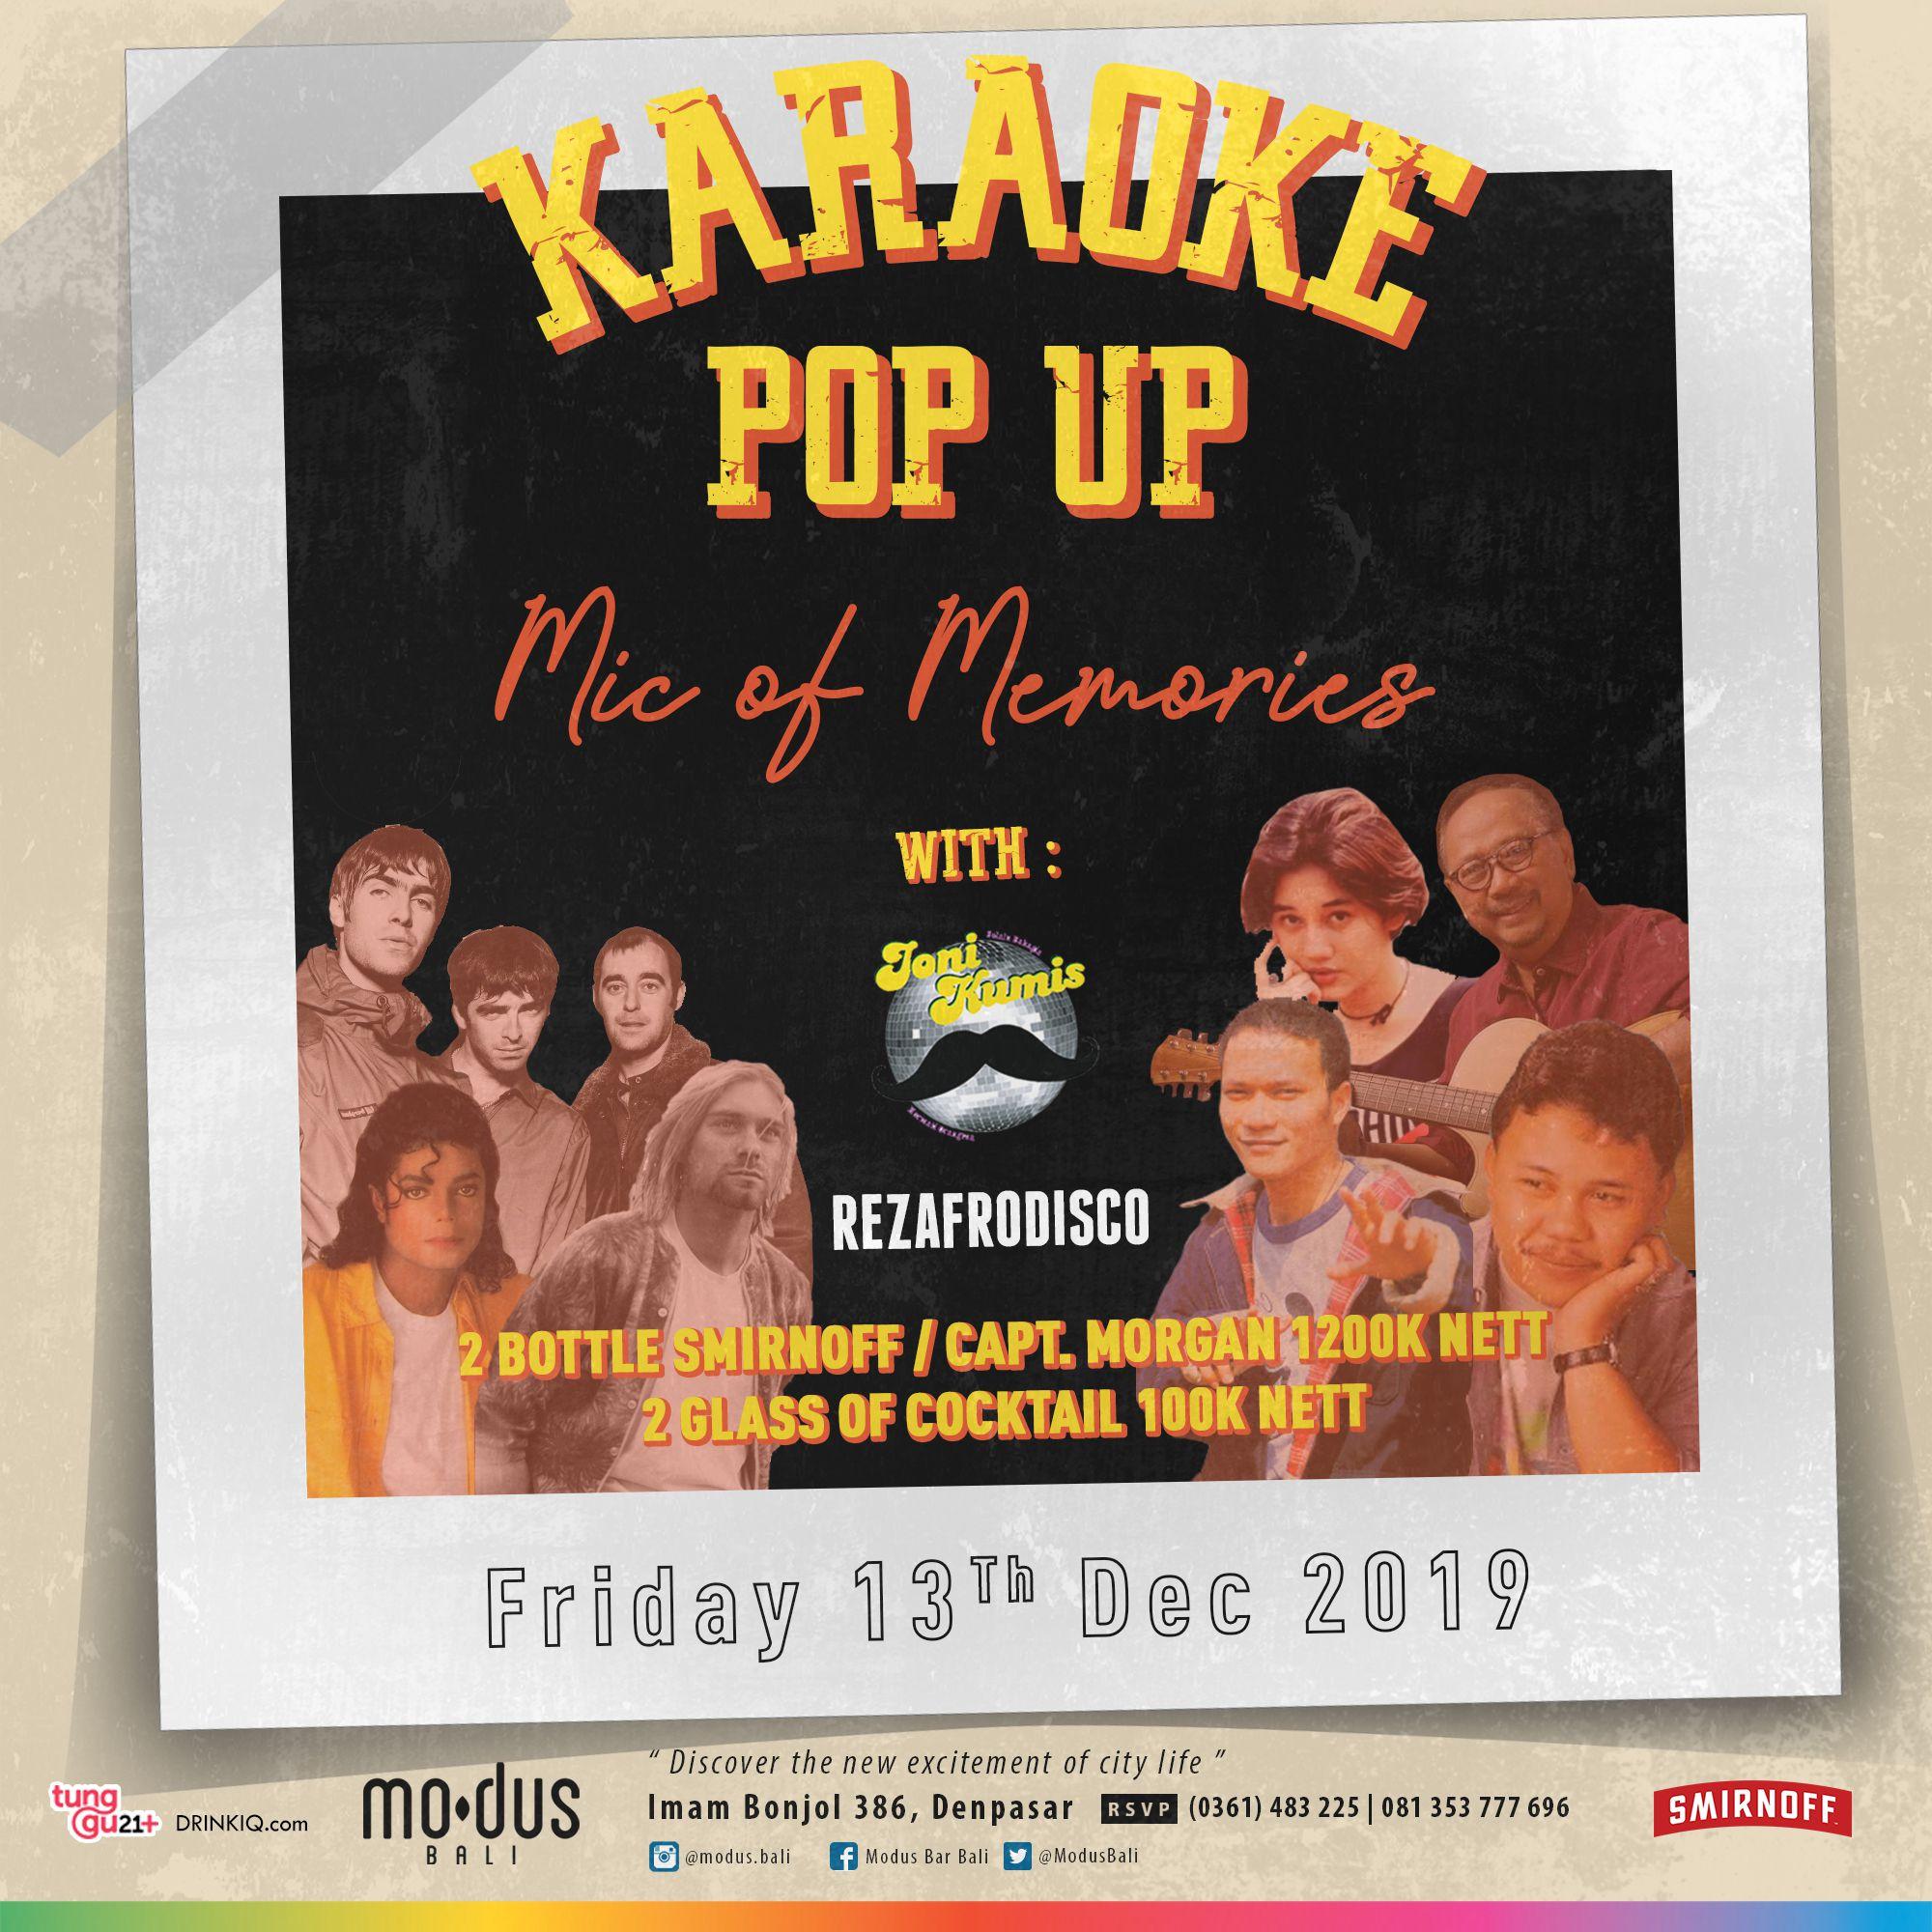 KARAOKE POP UP: MIC OF MEMORIES